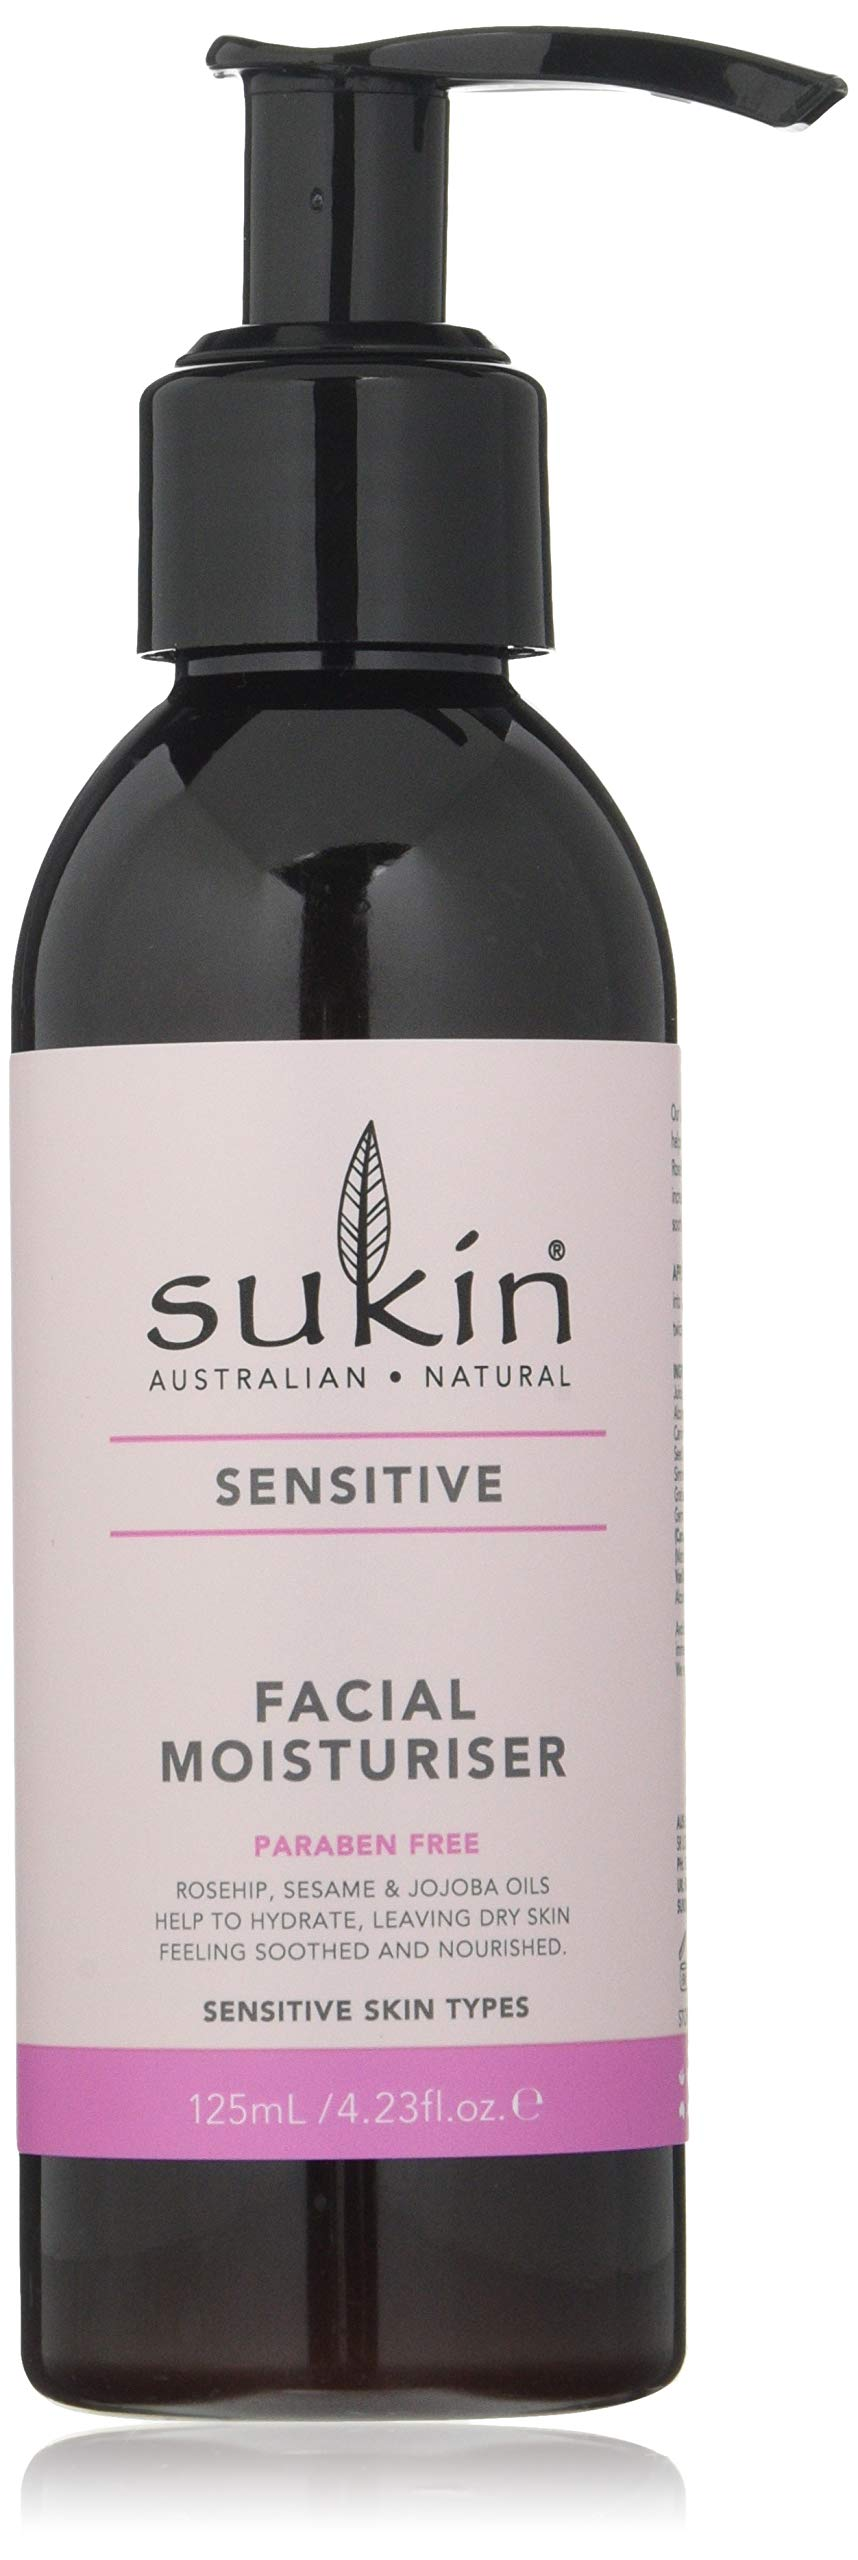 Sukin Sensitive Facial Moisturiser 125ml